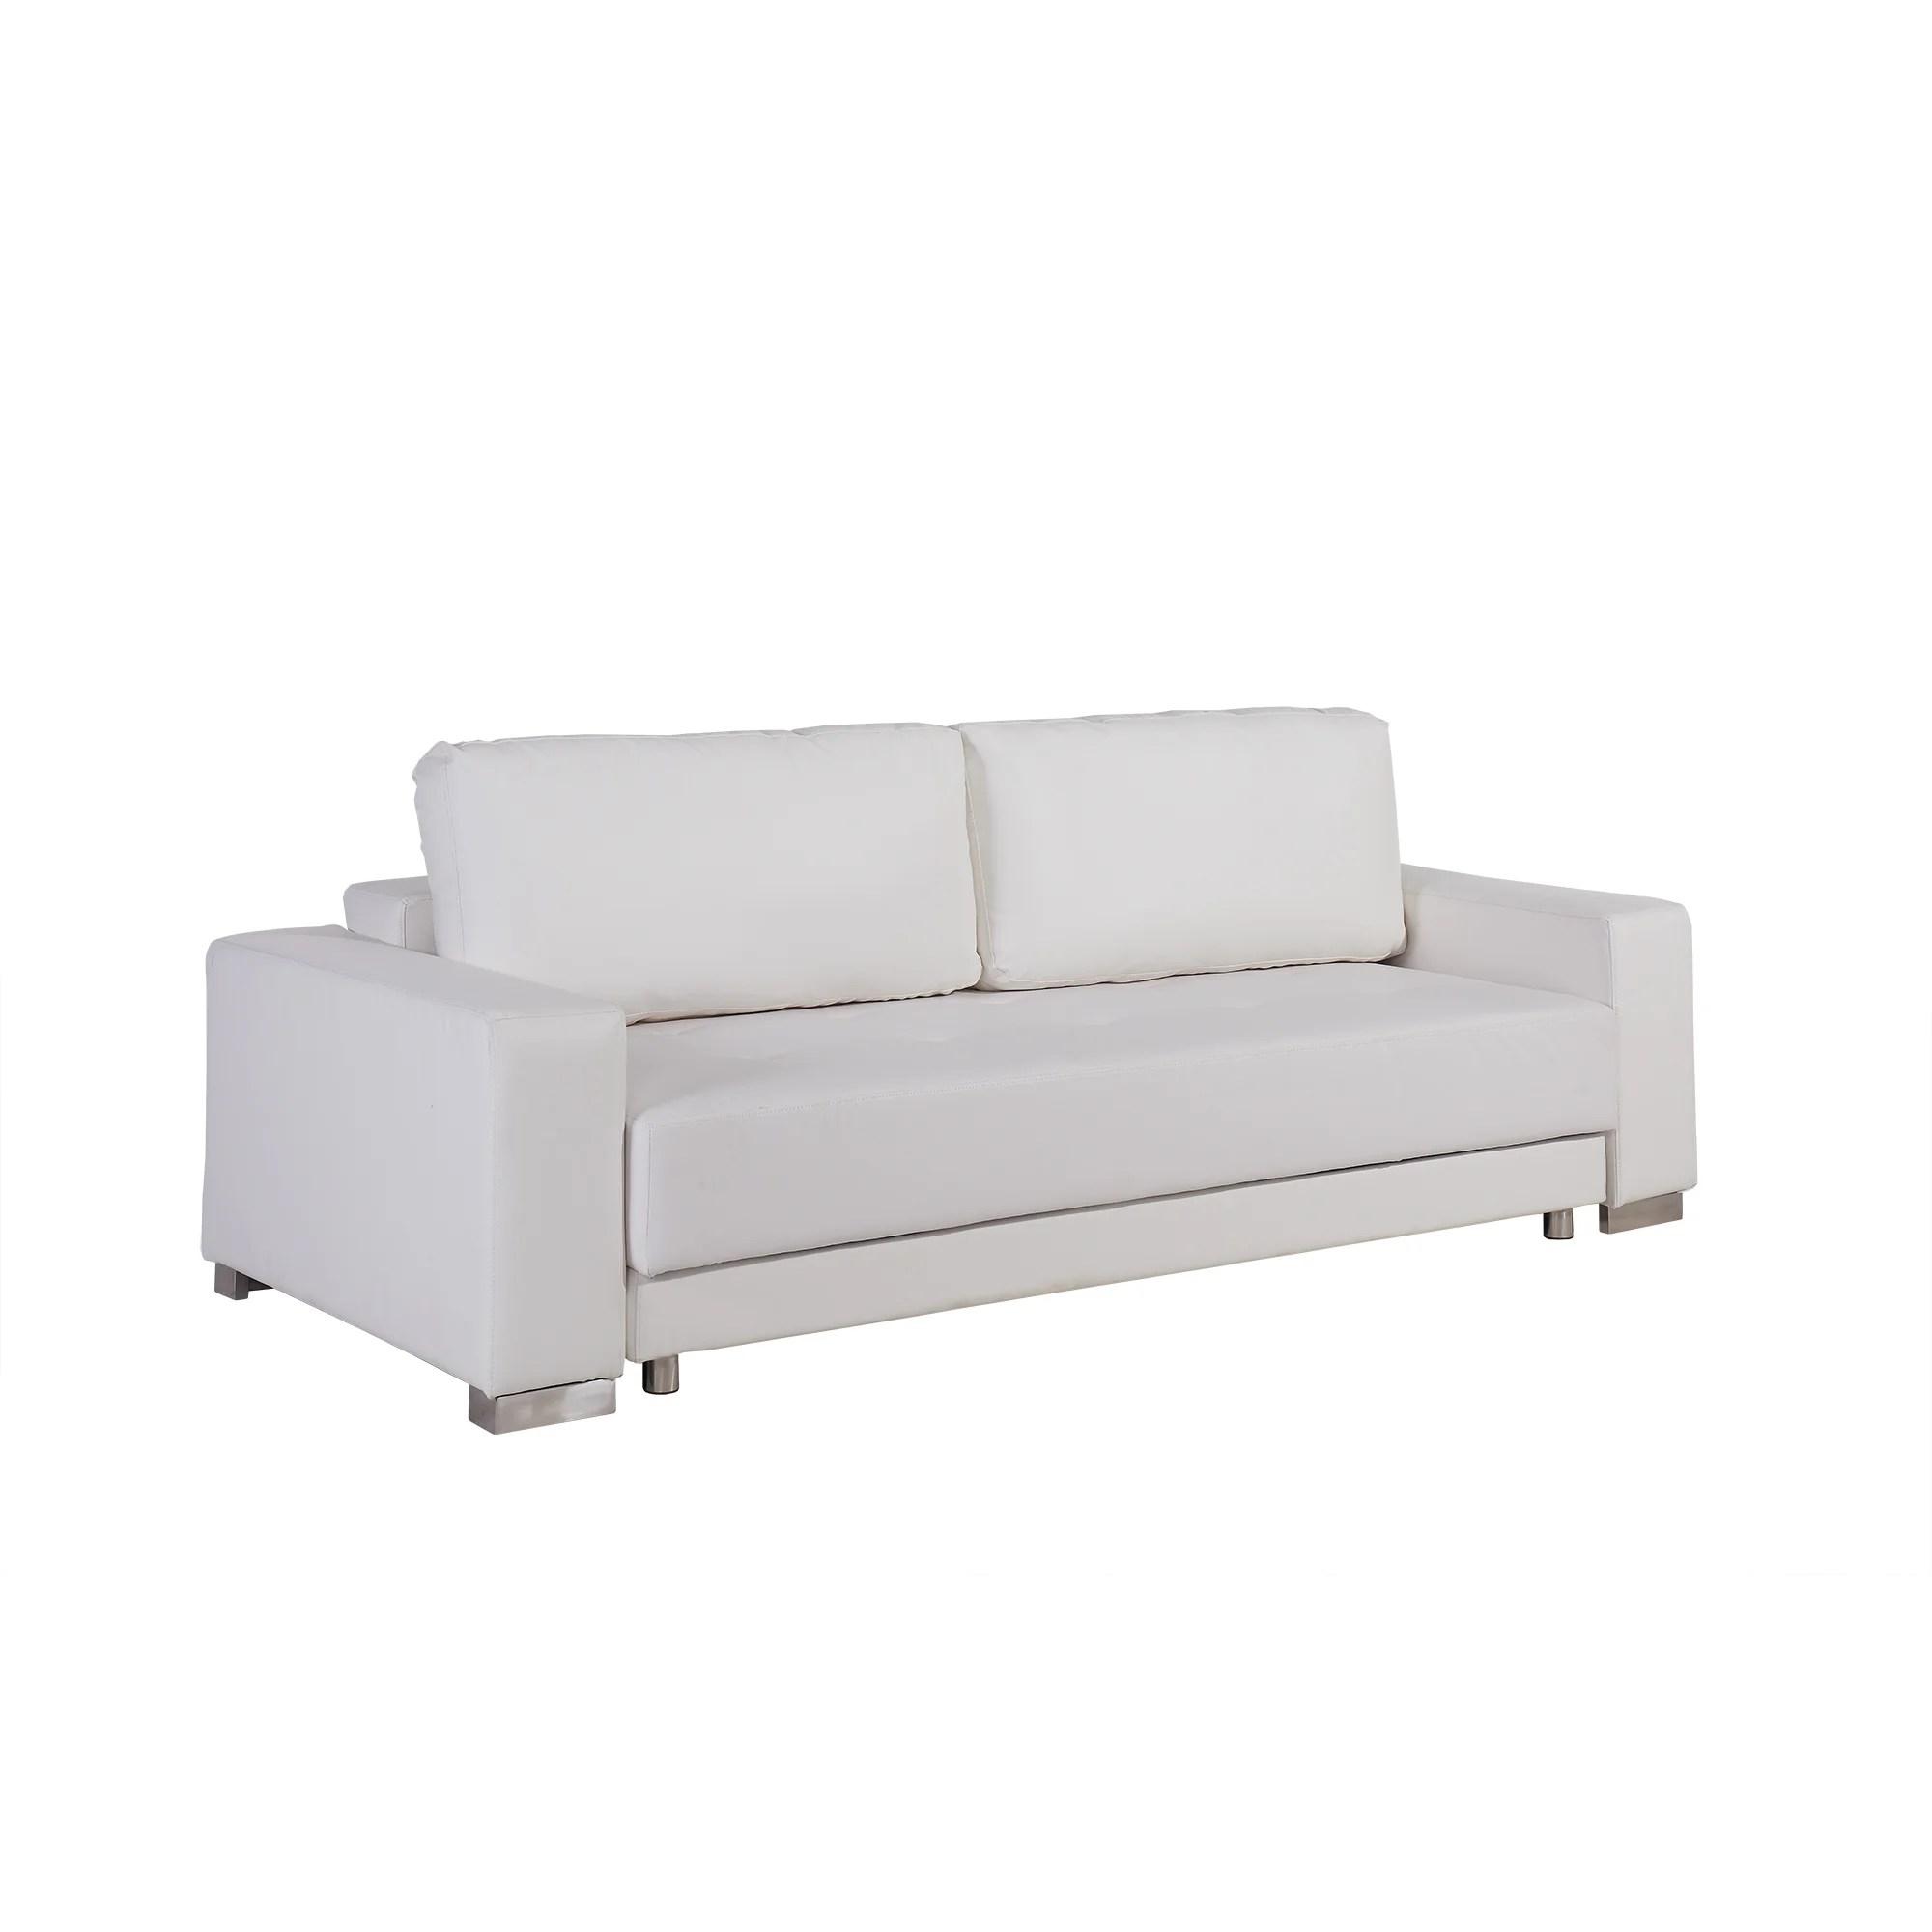 bianca futon sofa bed review olive green velvet chesterfield casabianca furniture cloe sleeper wayfair